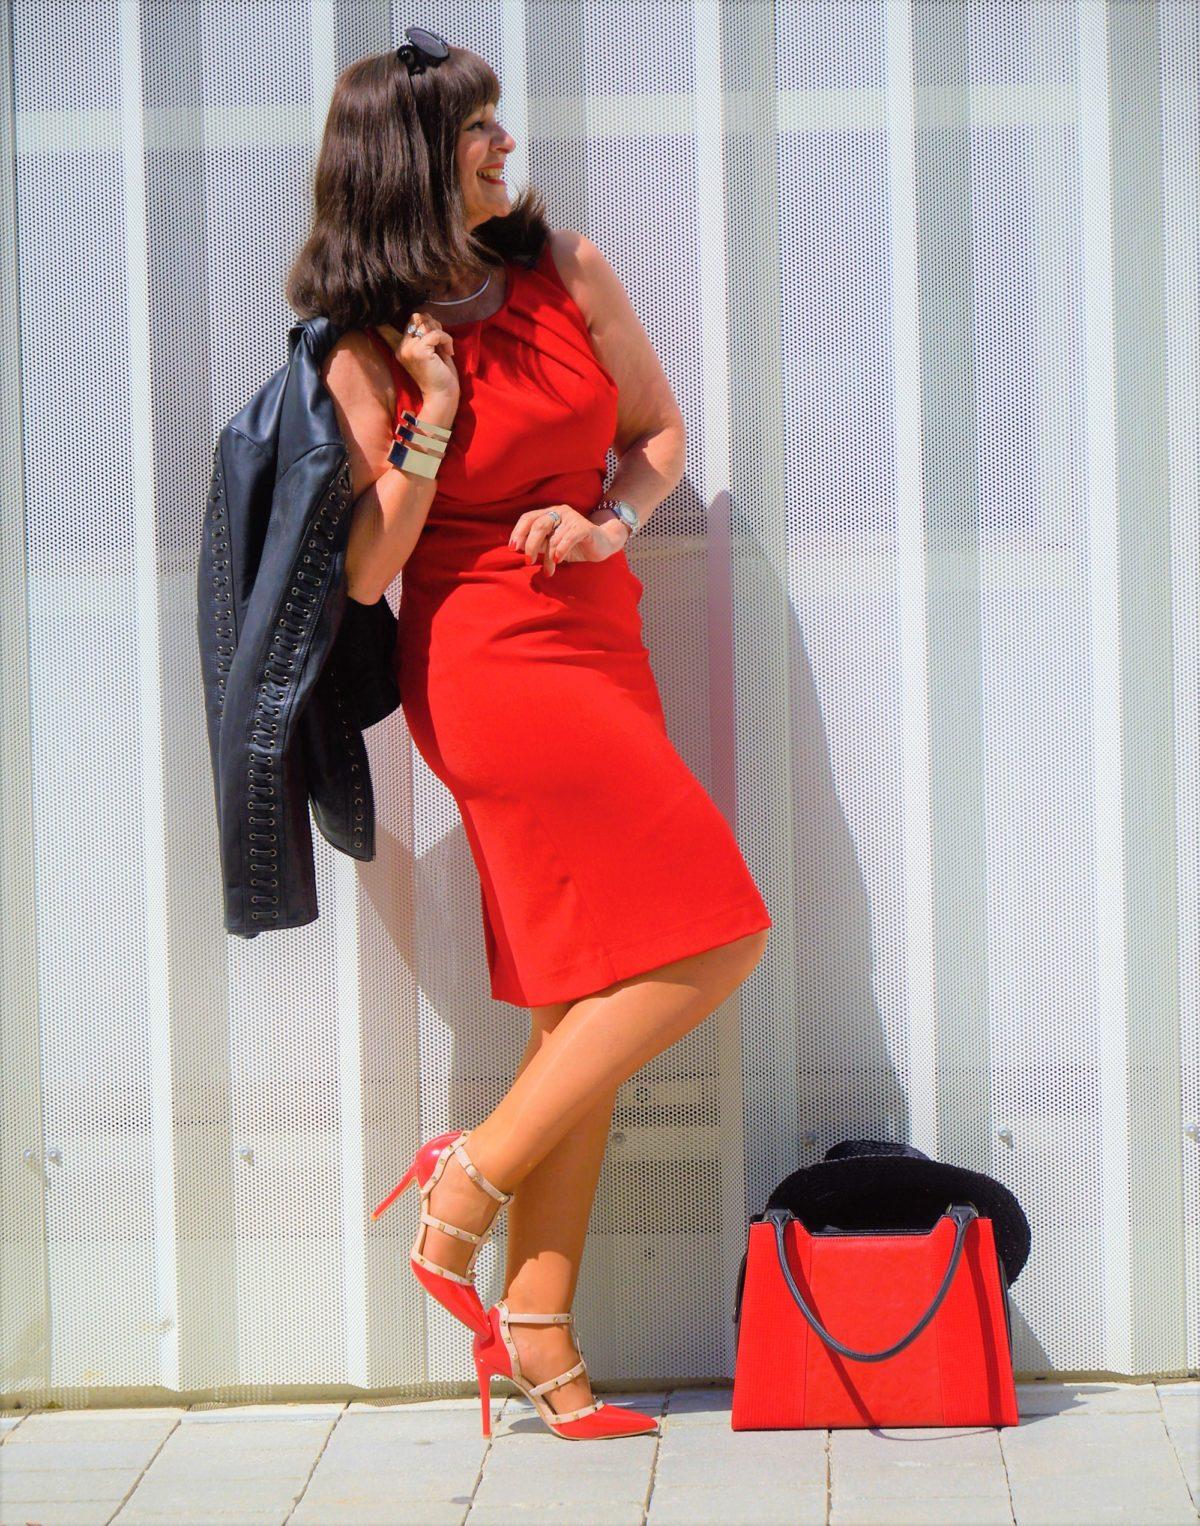 rot - starke farbe mit starker wirkung - martina berg - lady